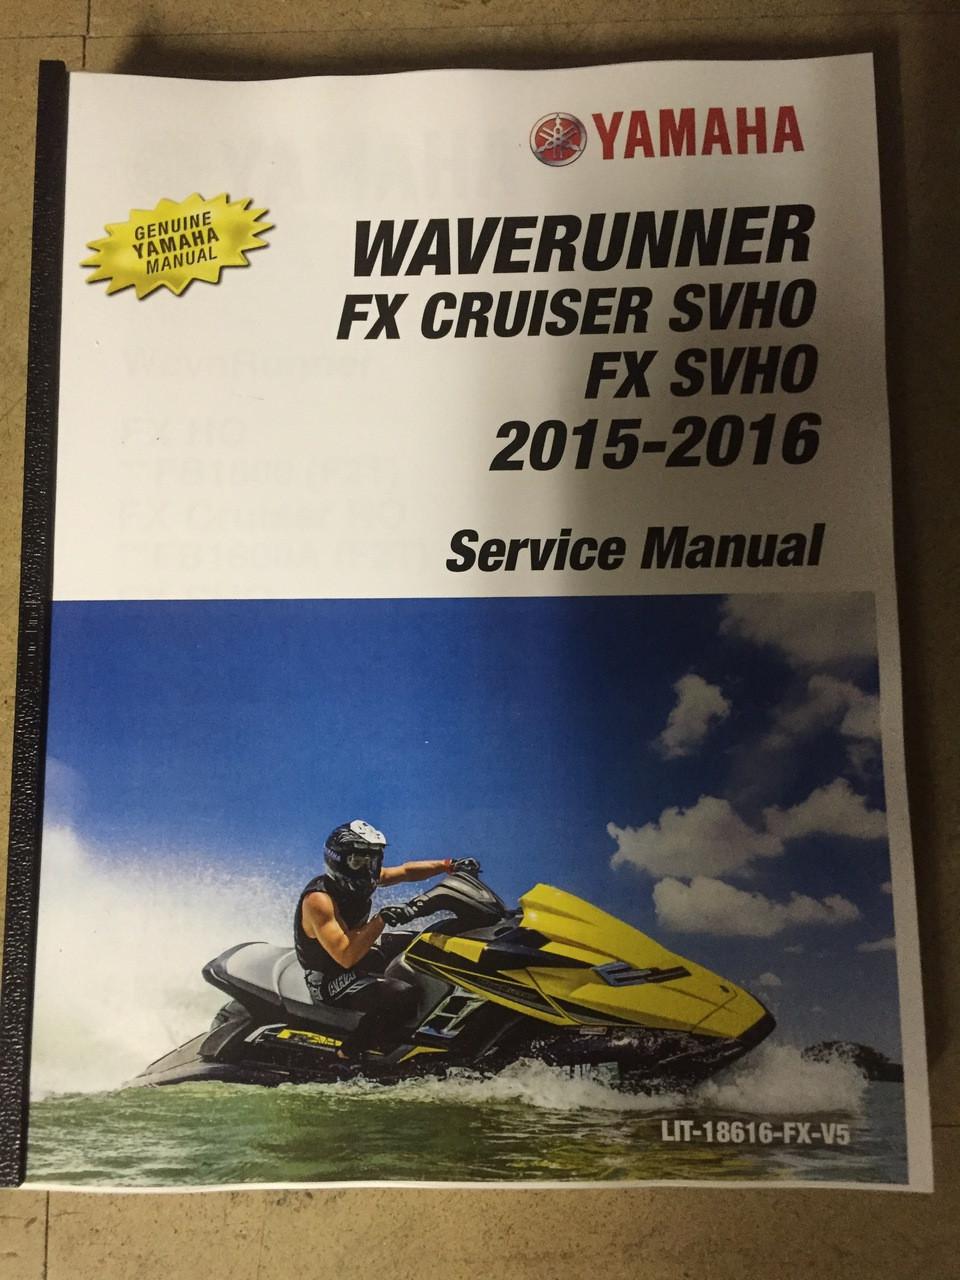 2015-2018 Yamaha WaveRunner FX Cruiser SVHO / FX Cruiser SHO / FX Cruiser  HO / FX HO / FX SHO / FX SVHO Part# LIT-18616-FX-V5 service shop repair